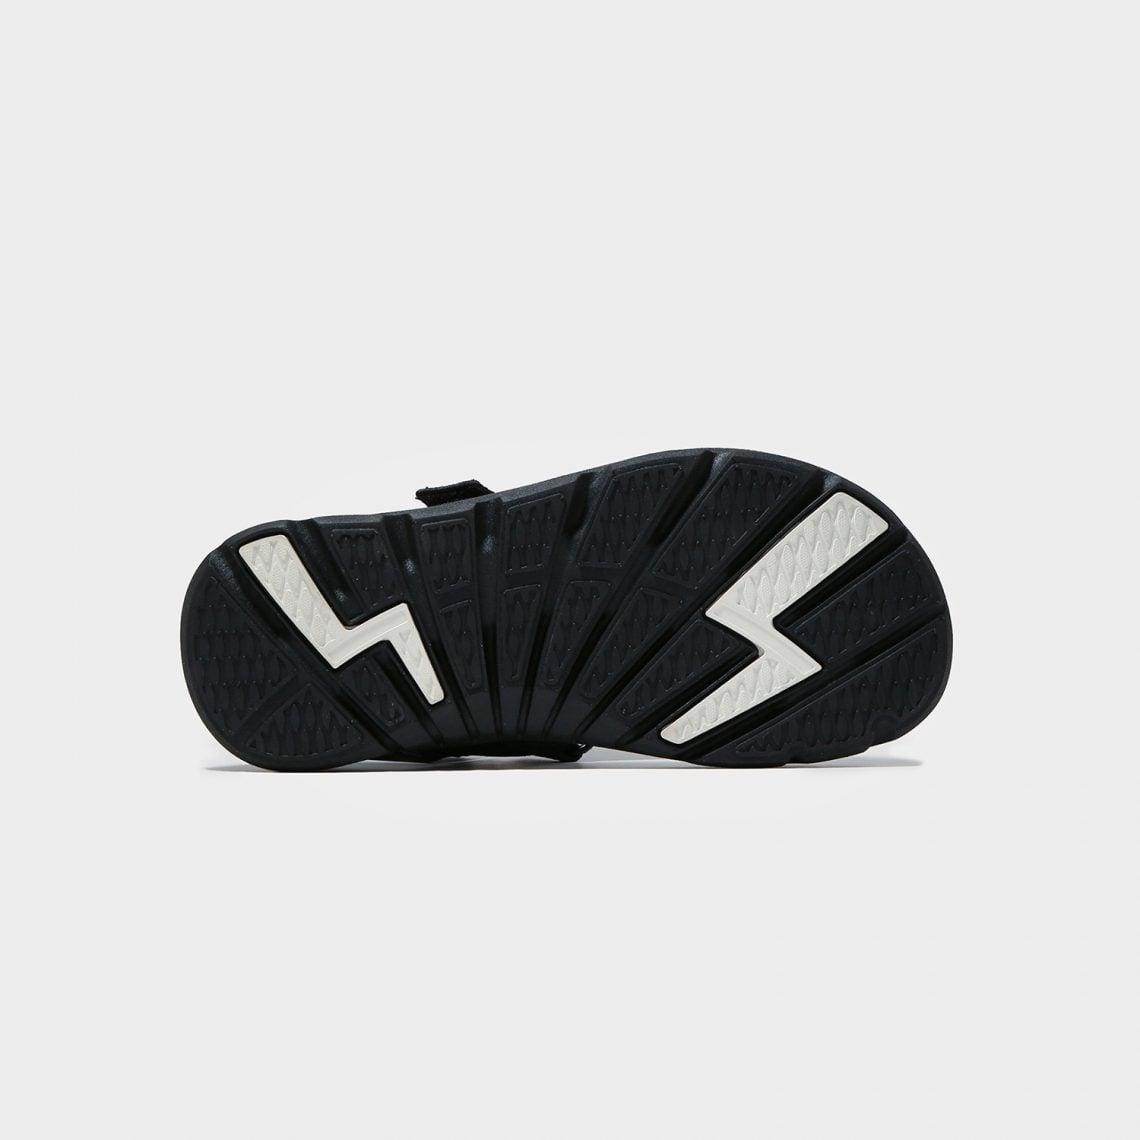 Giày Sandals Unisex SHONDO F6 Sport F6S301 3